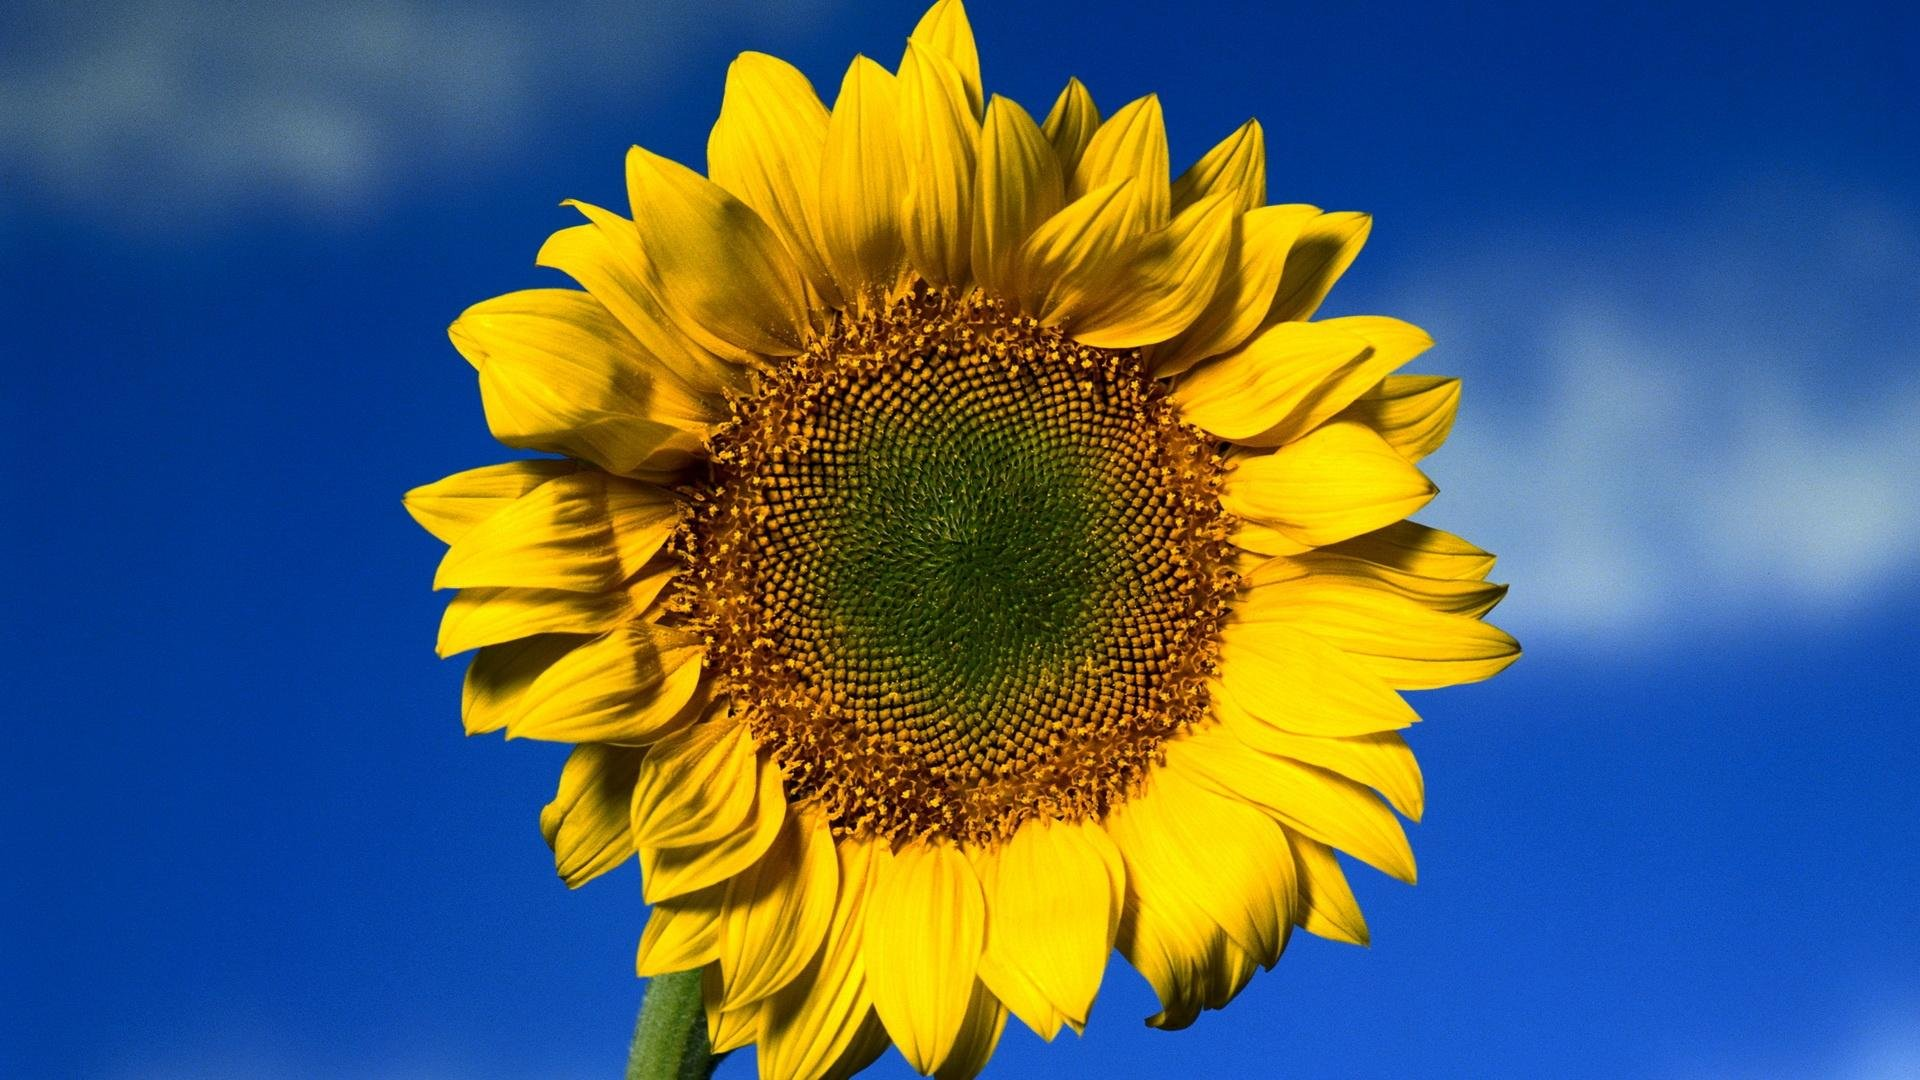 Sunflower wallpapers 1920x1080 Full HD (1080p) desktop ...